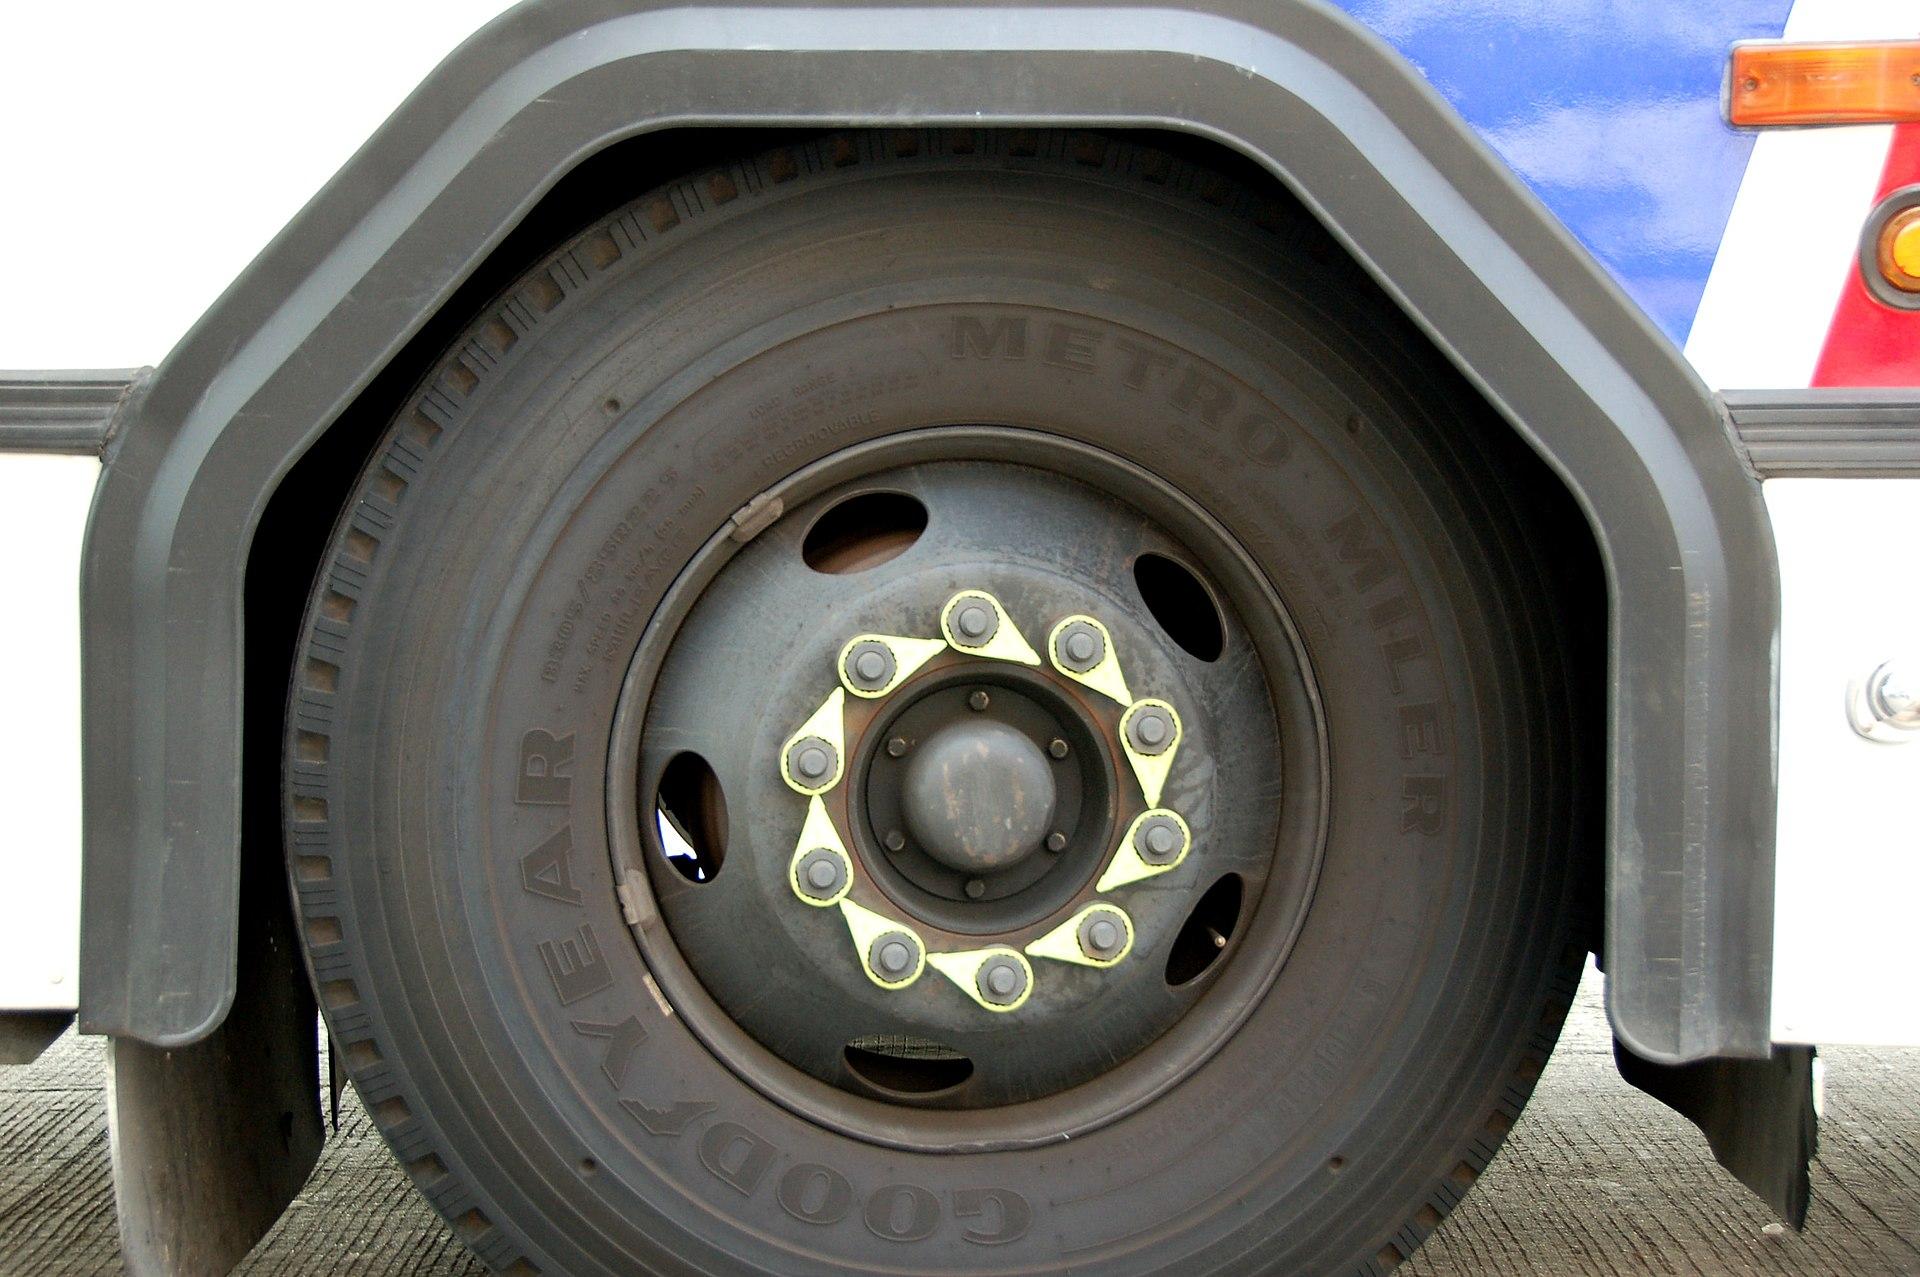 Loose wheel nut indicator - Wikipedia